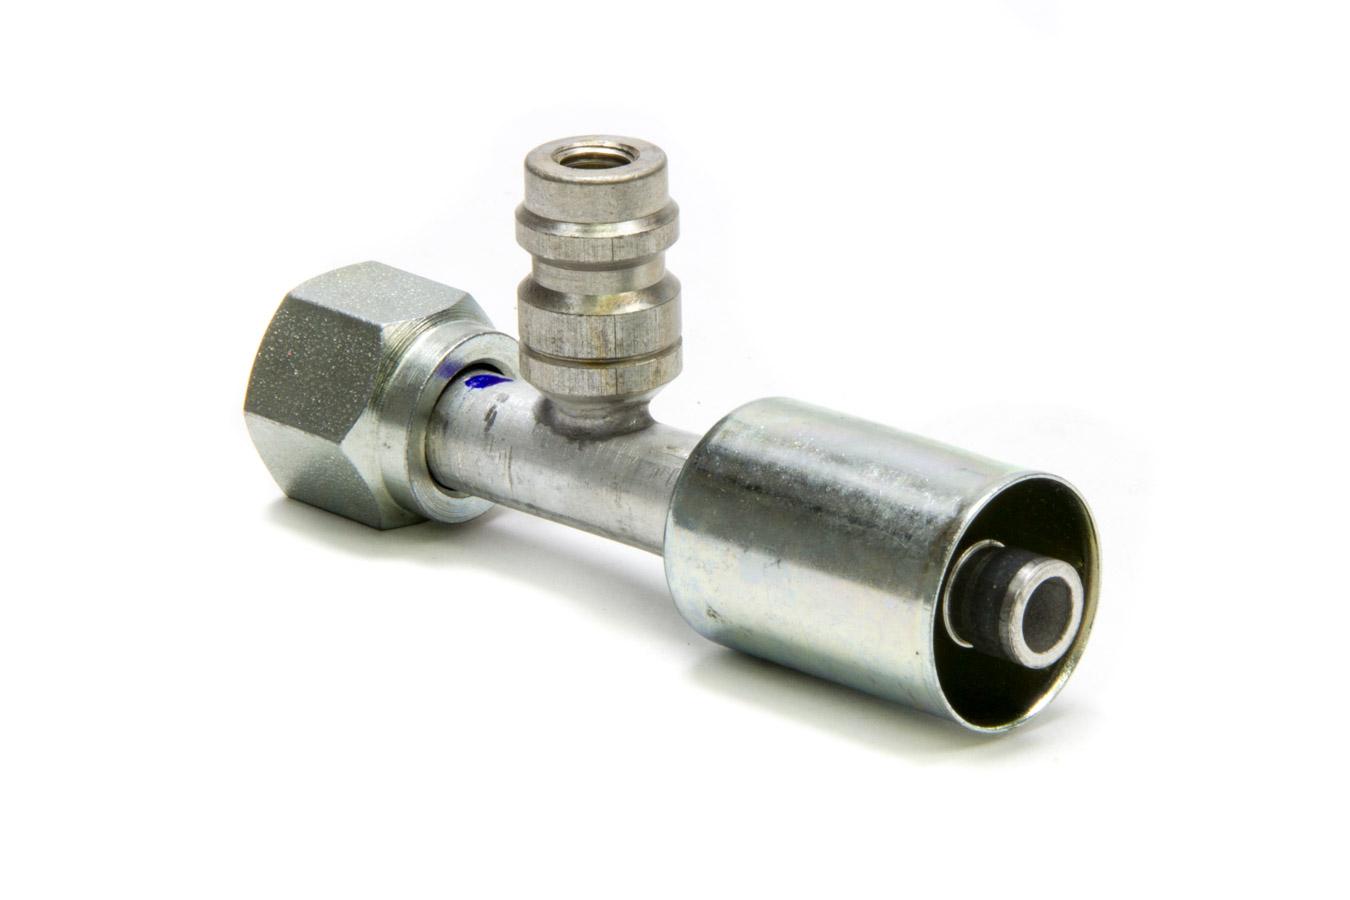 Vintage Air #8 45 Degree Beadlock O-Ring Fitting w//Port